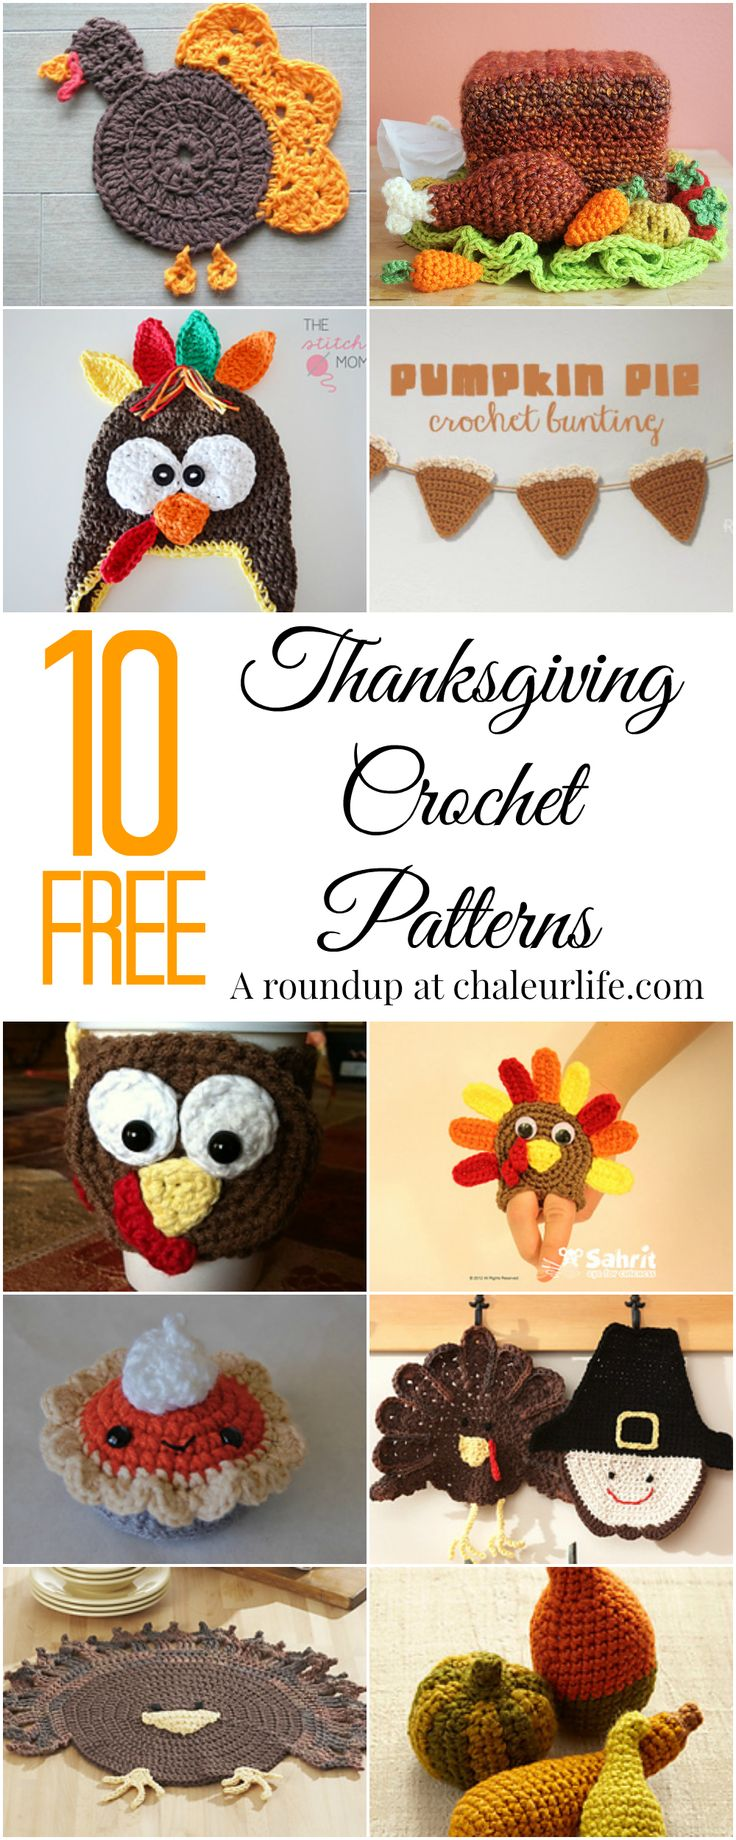 10 Free Thanksgiving Crochet Patterns – Chaleur Life